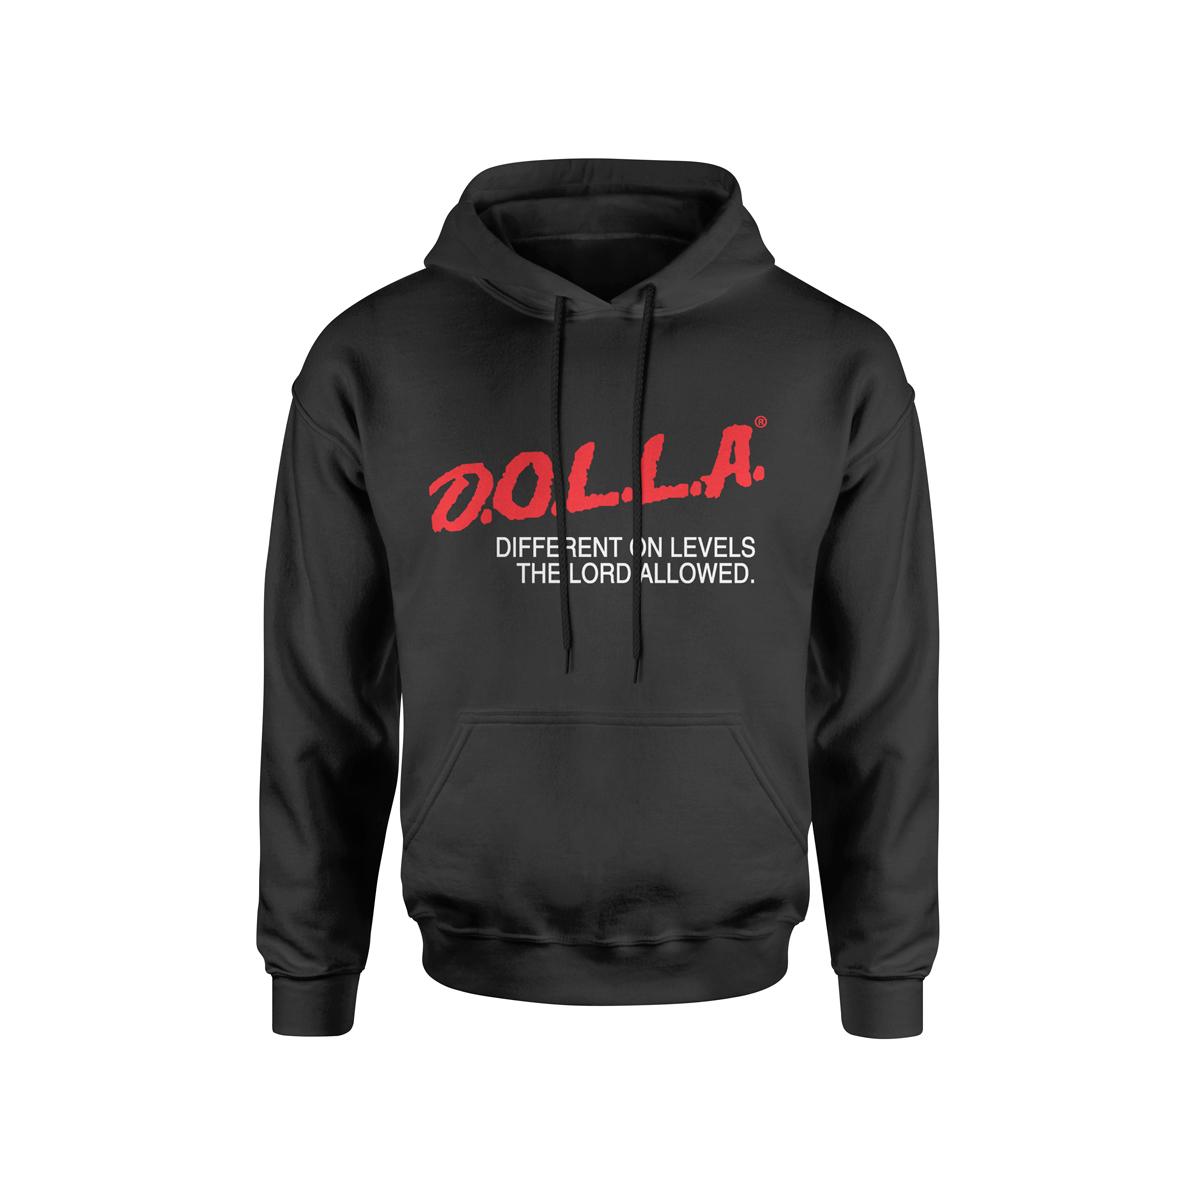 D.O.L.L.A. Hoodie & BIG D.O.L.L.A. Deluxe Digital Download